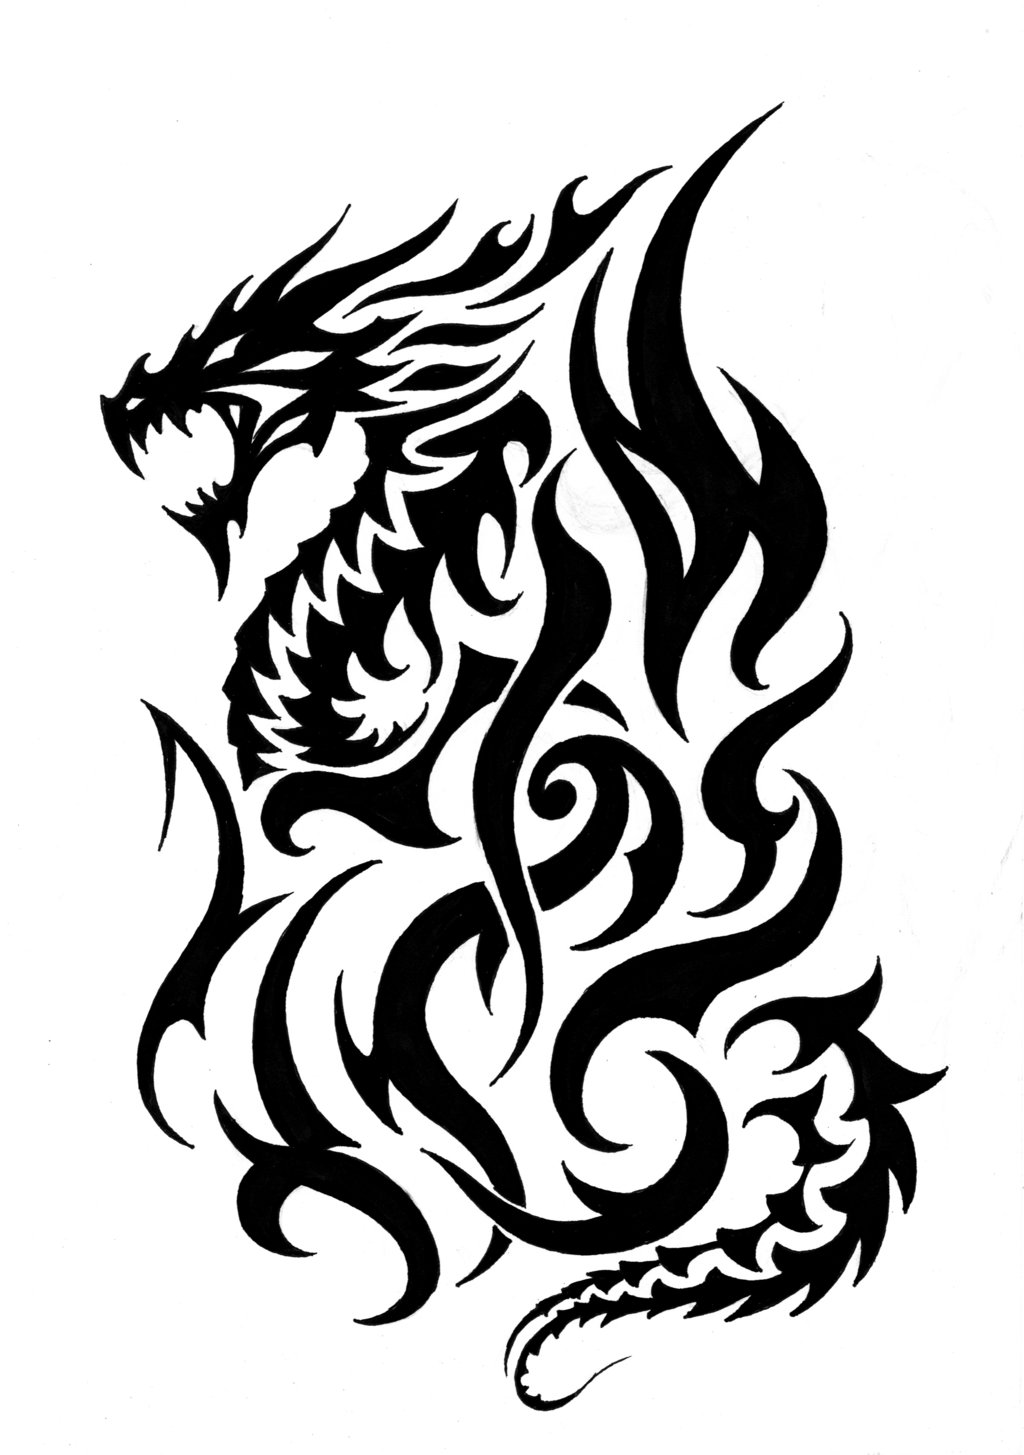 Fire Breathing Dragon Tattoo Designs Fire Breathing Dragon Tattoo